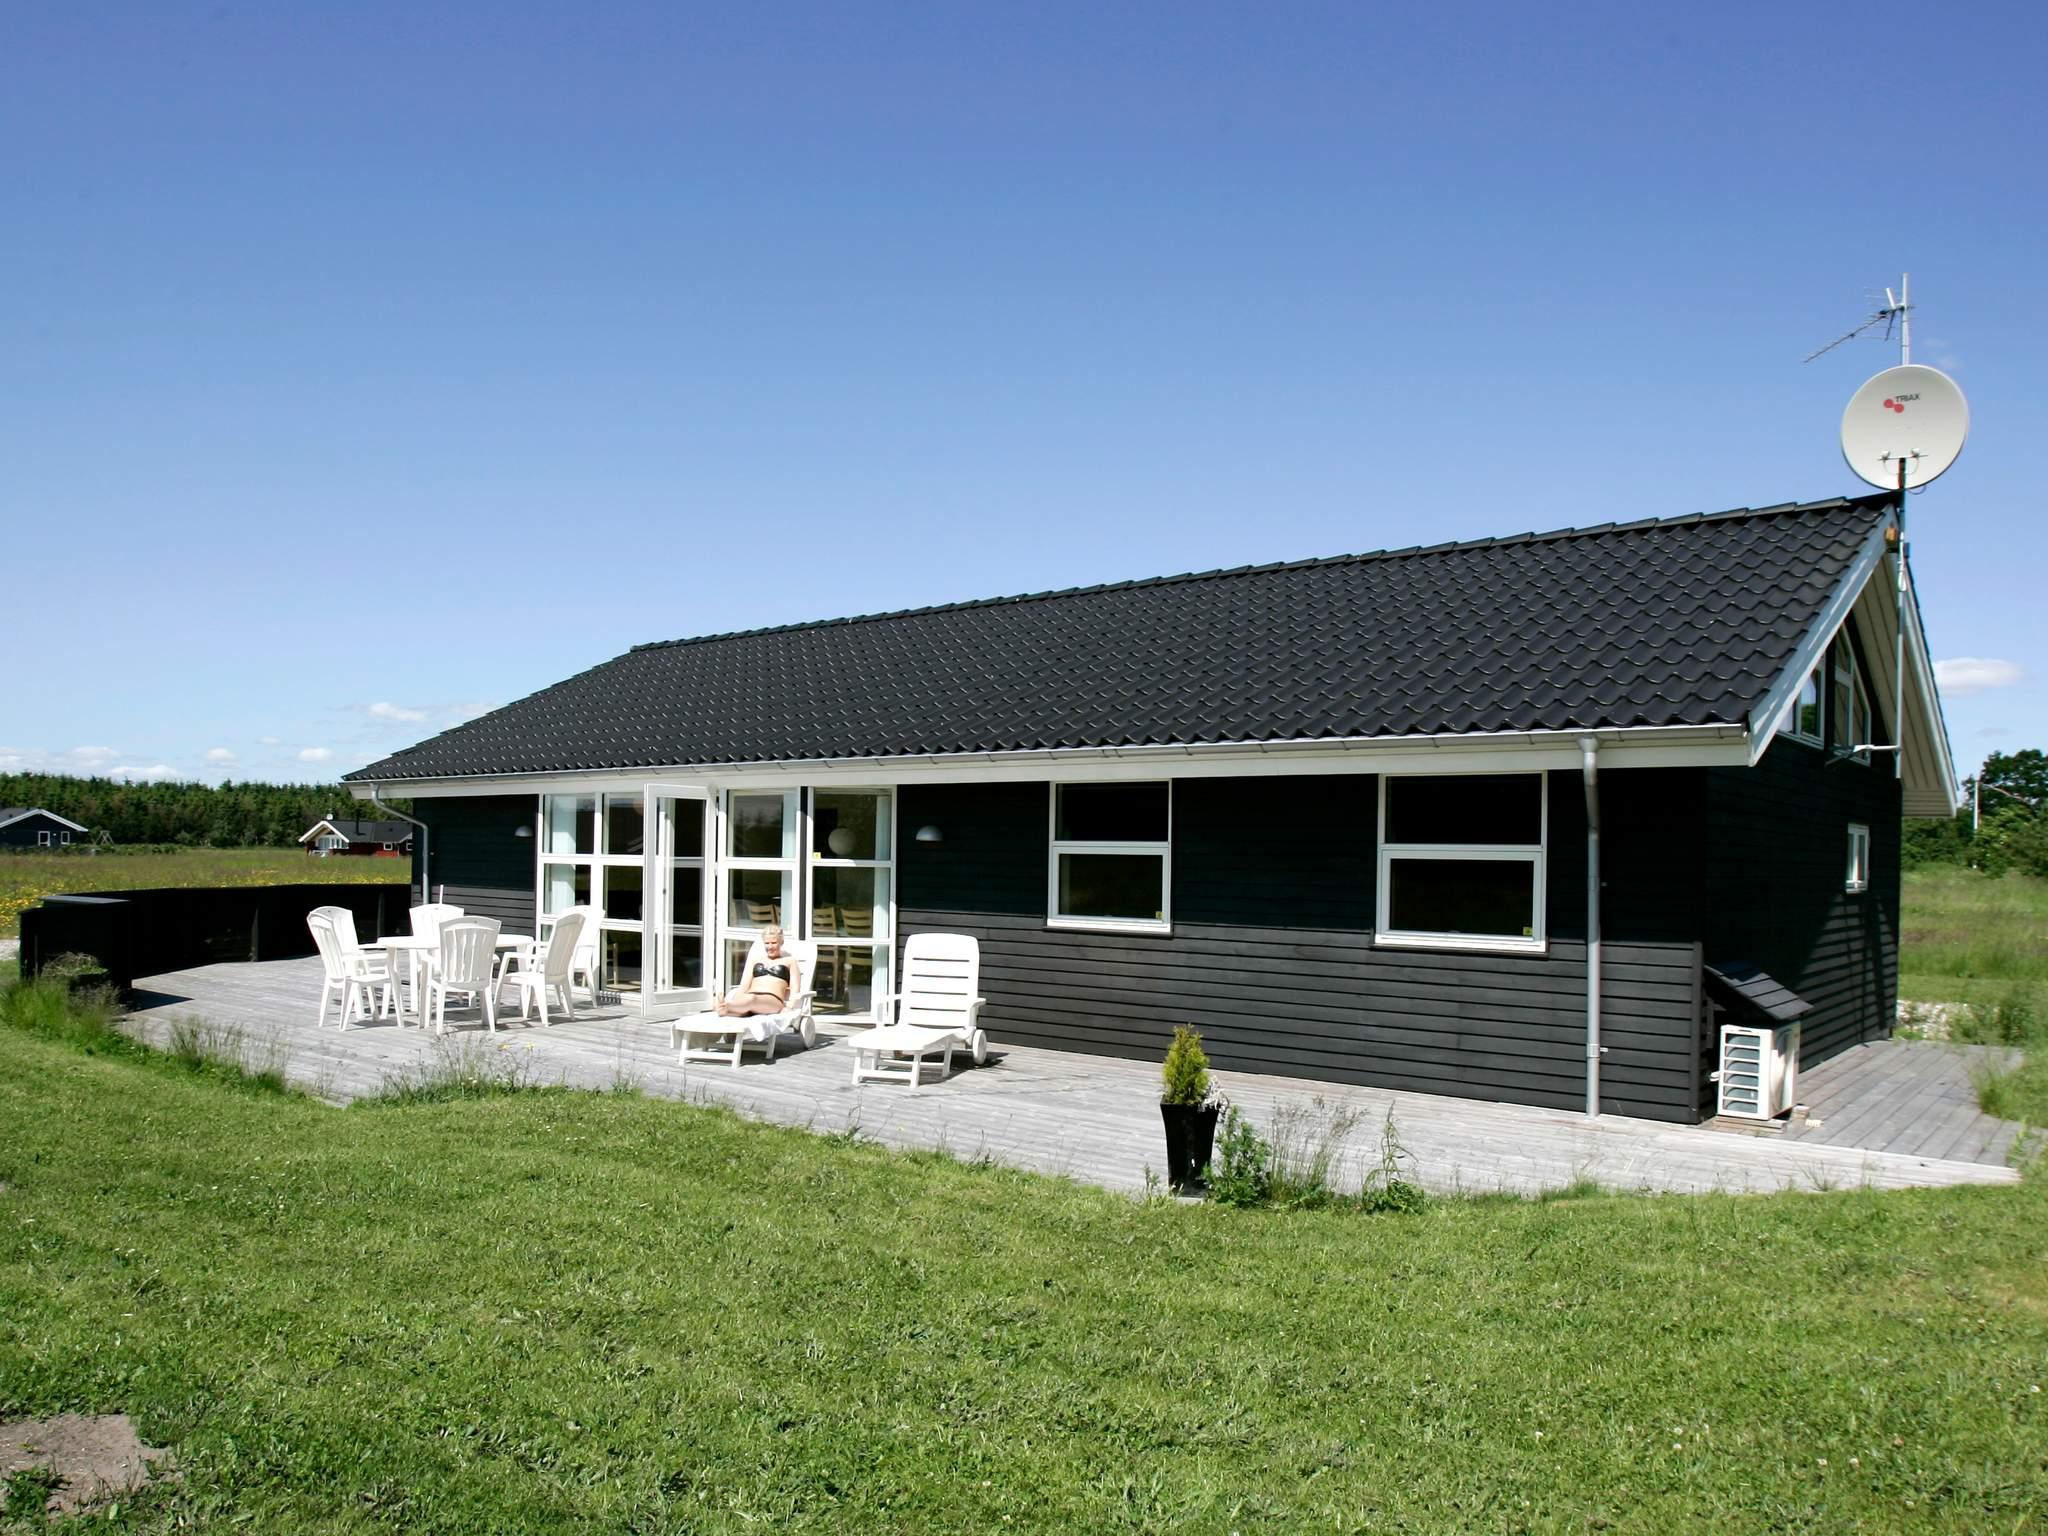 Ferienhaus Øster Hurup (487406), Øster Hurup, , Ostjütland, Dänemark, Bild 1